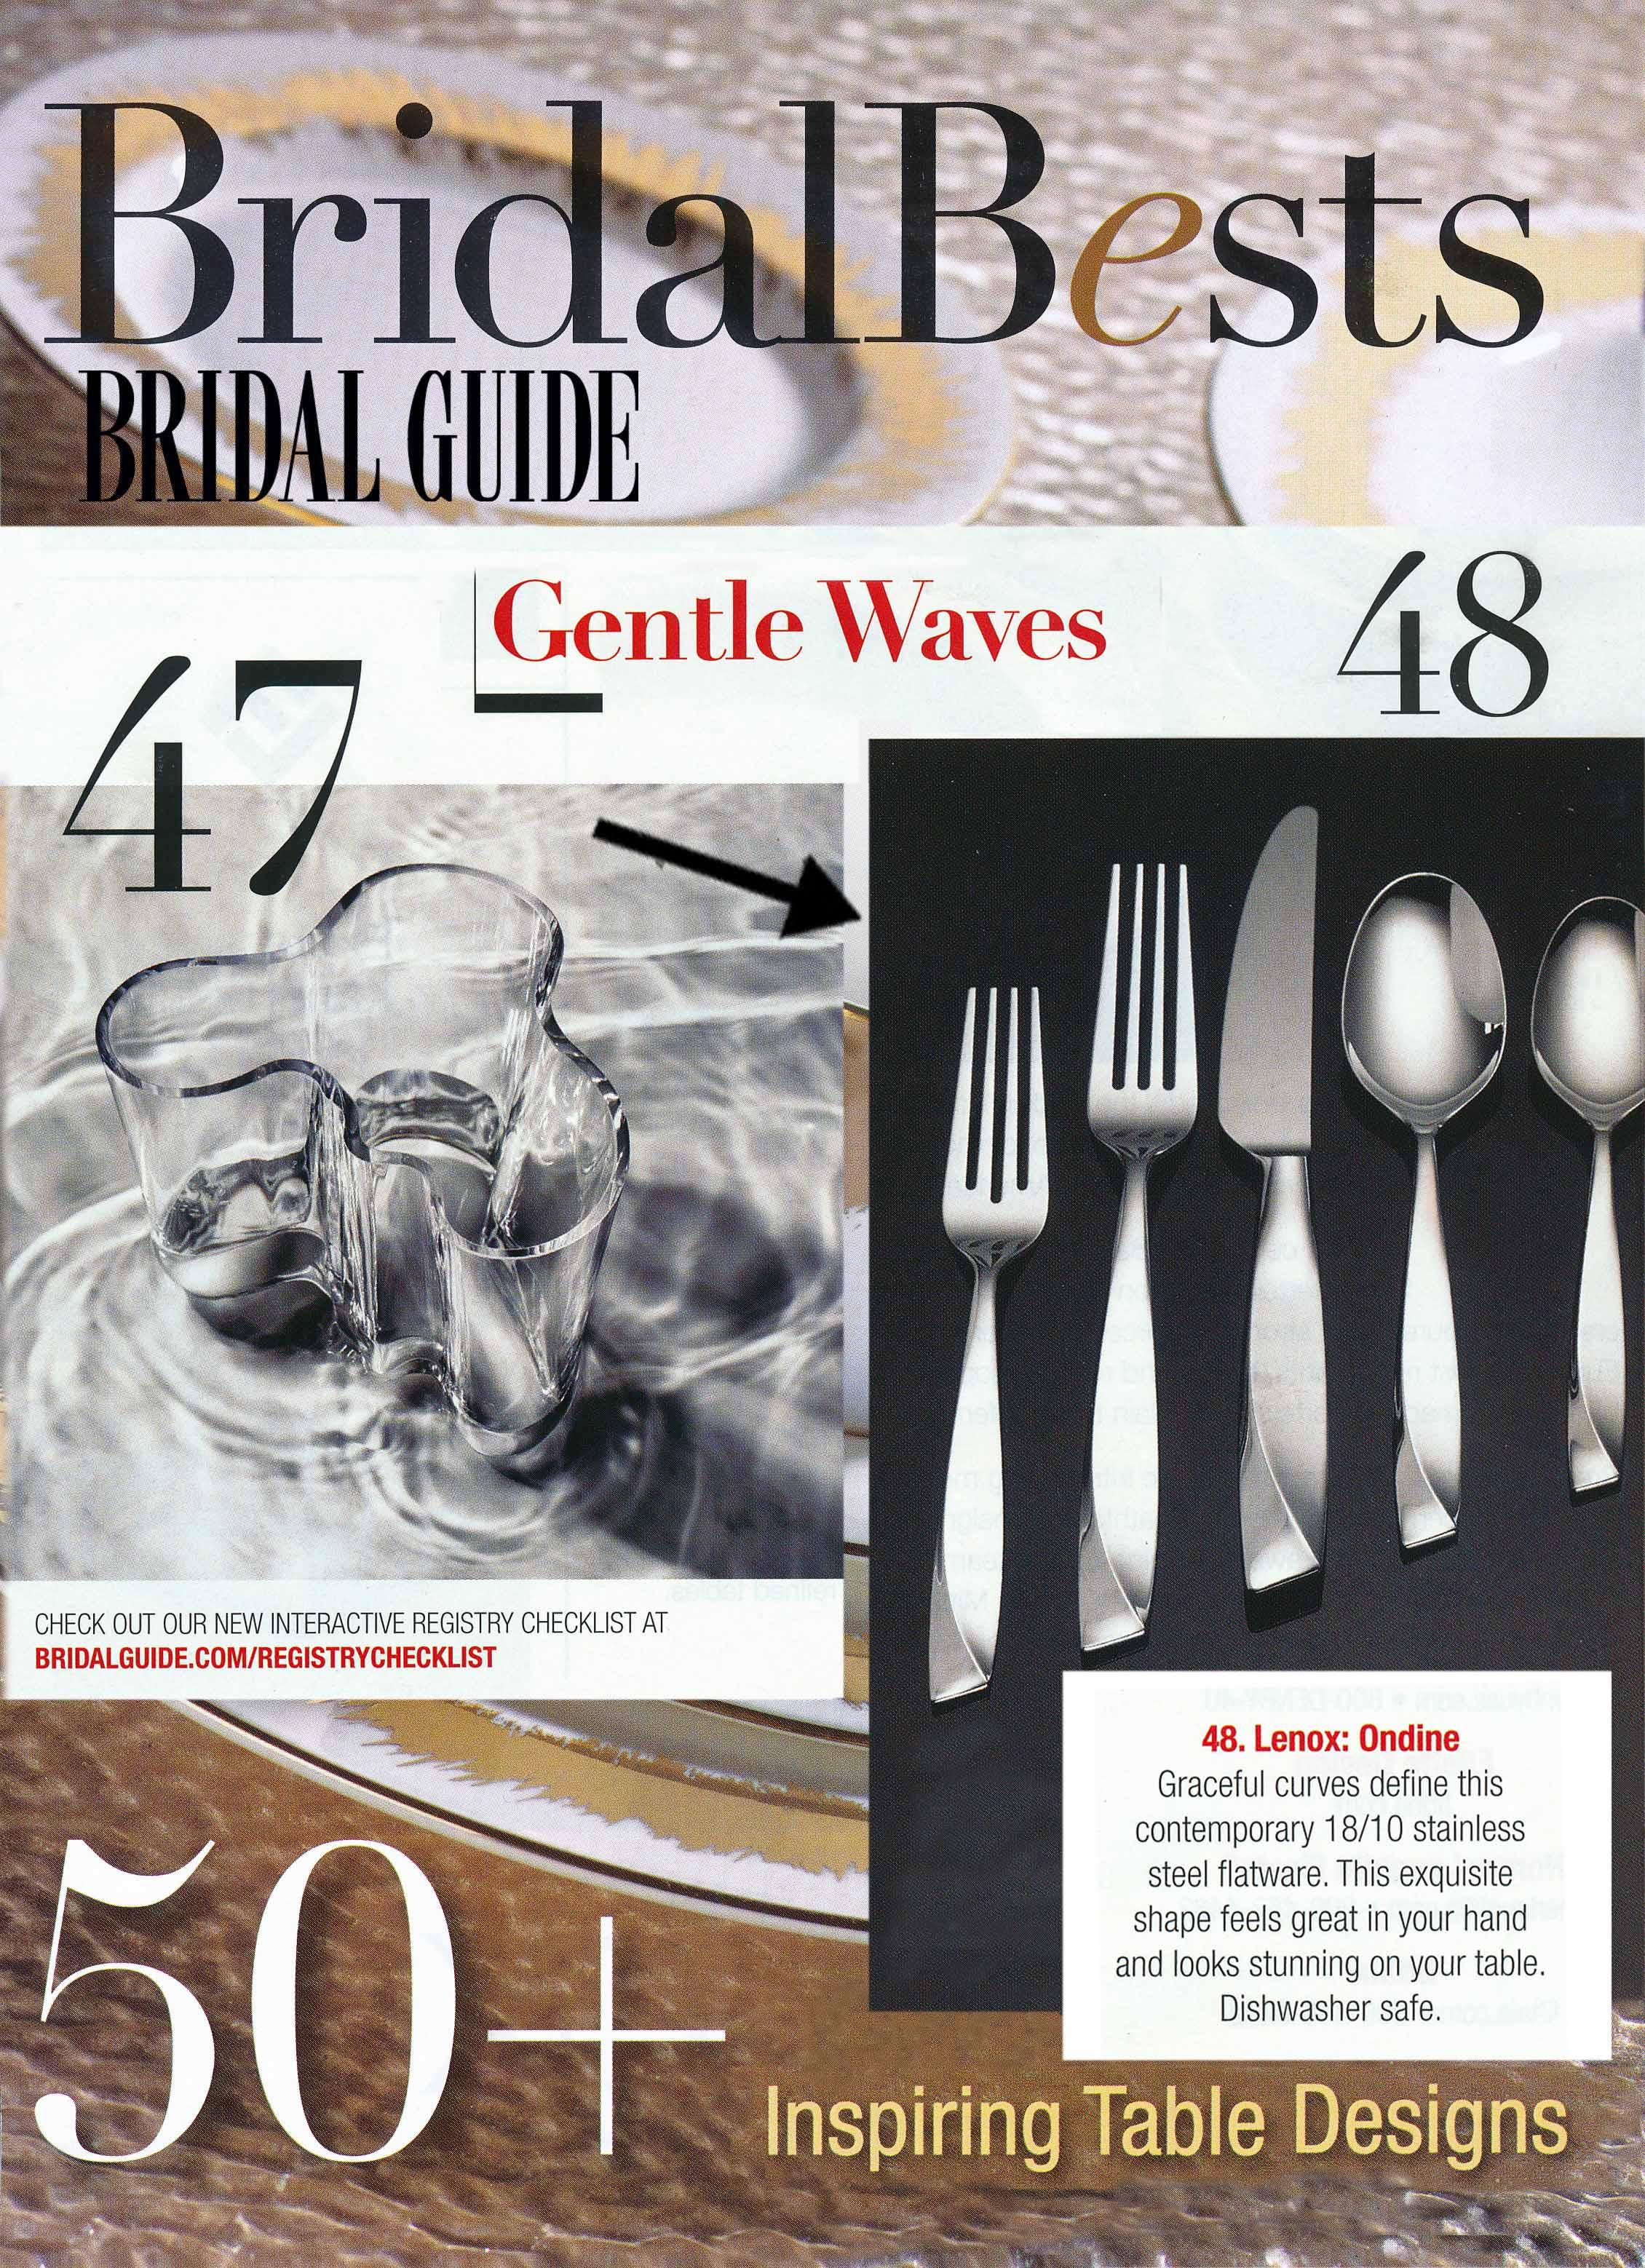 Bridal Guide Ondine Flatware.jpg